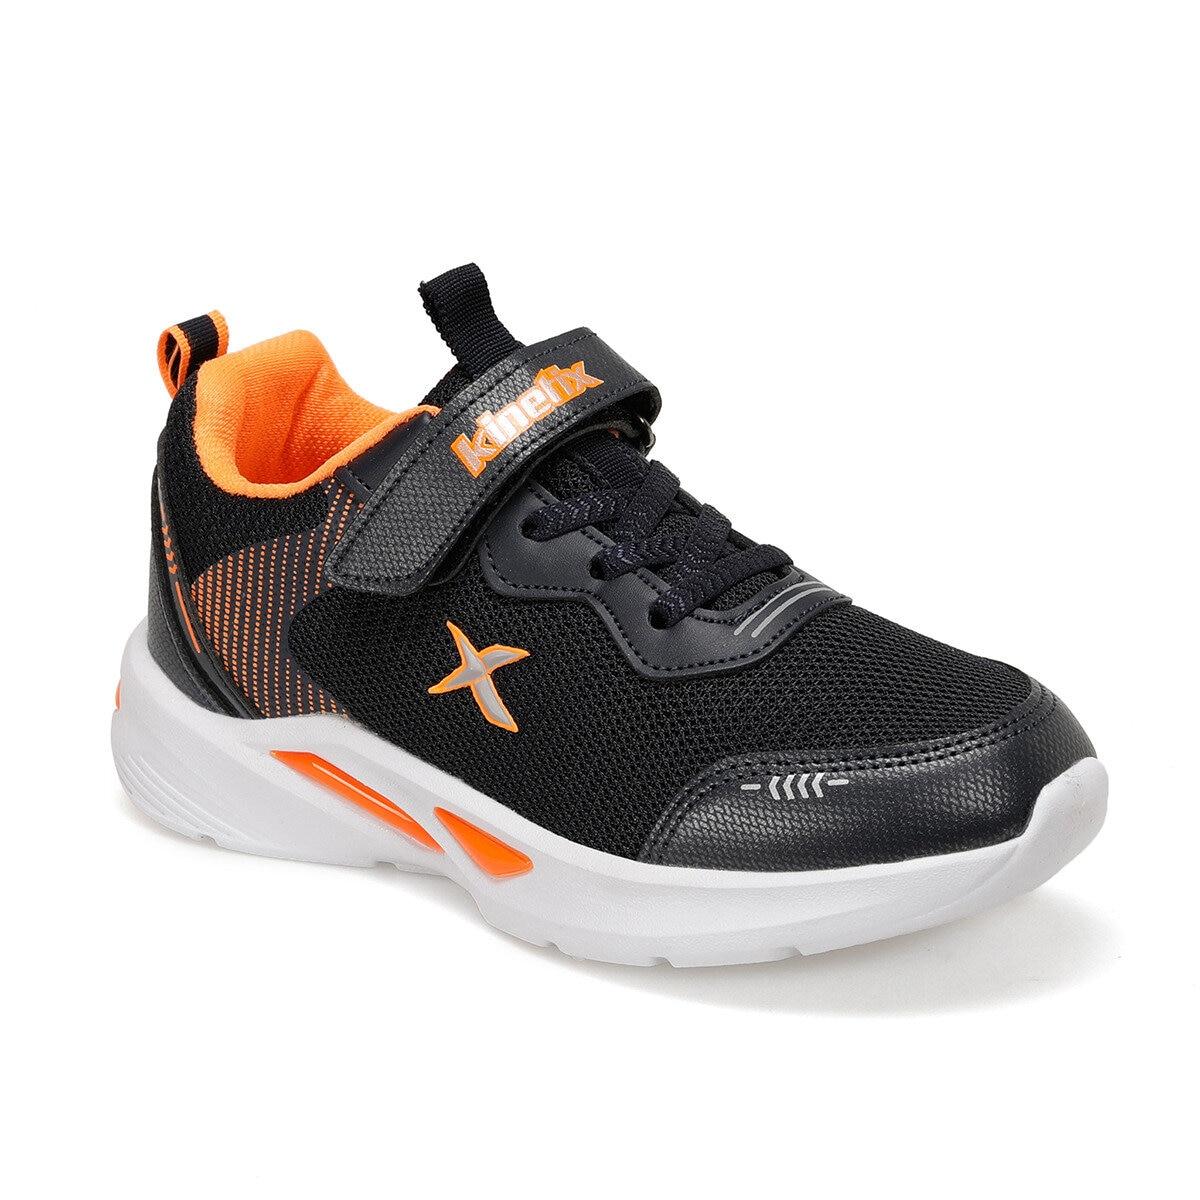 FLO TRIANGLE White Male Child Hiking shoes KINETIX